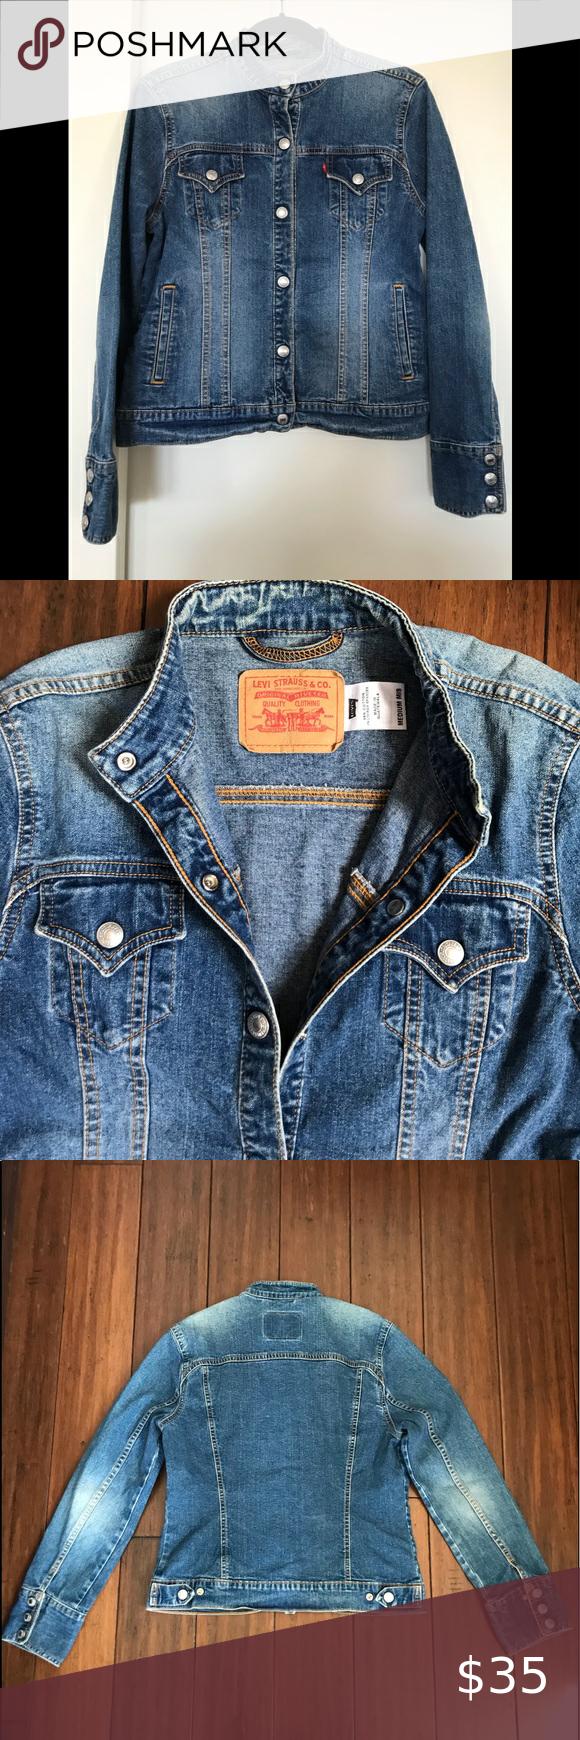 Levi Strauss Collarless Blue Denim Jeans Jacket Levi Denim Jeans Jean Jacket [ 1740 x 580 Pixel ]